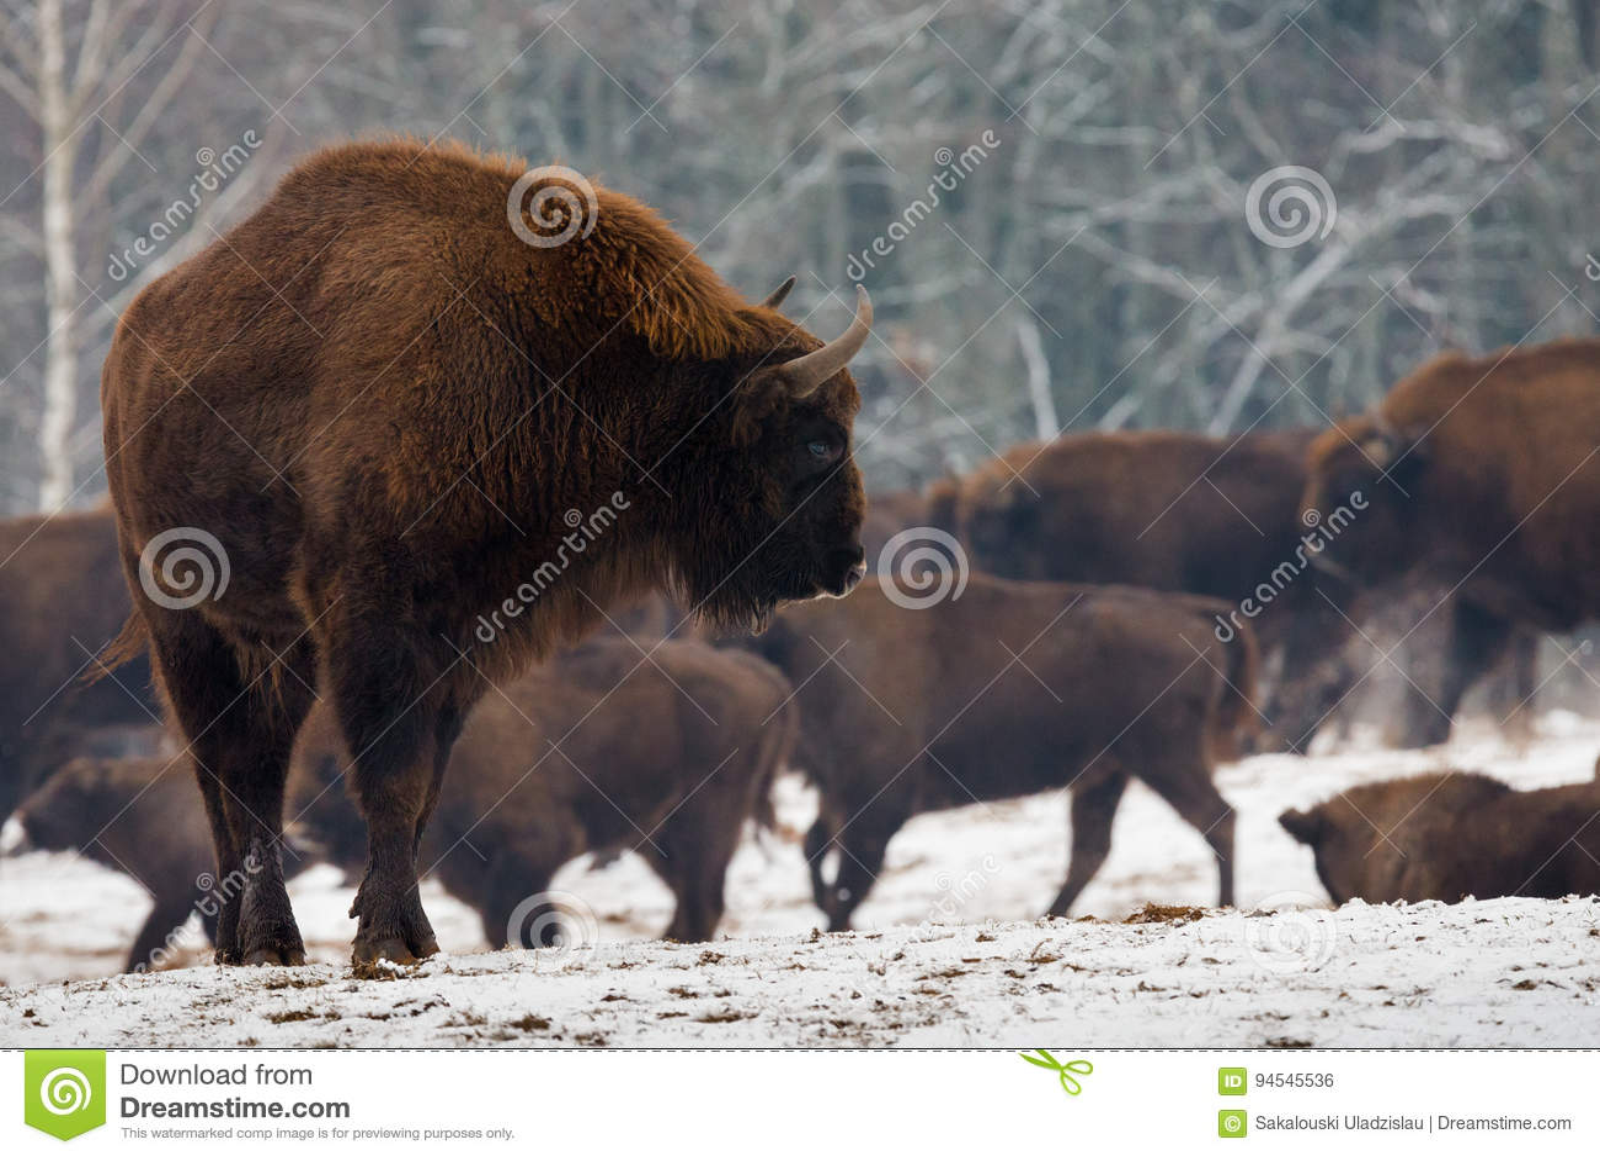 Portret van Europees Bison Aurochs In Wild Nature Krachtig Volwassen Europees Bison Close-Up On The Background van de Kudde in de